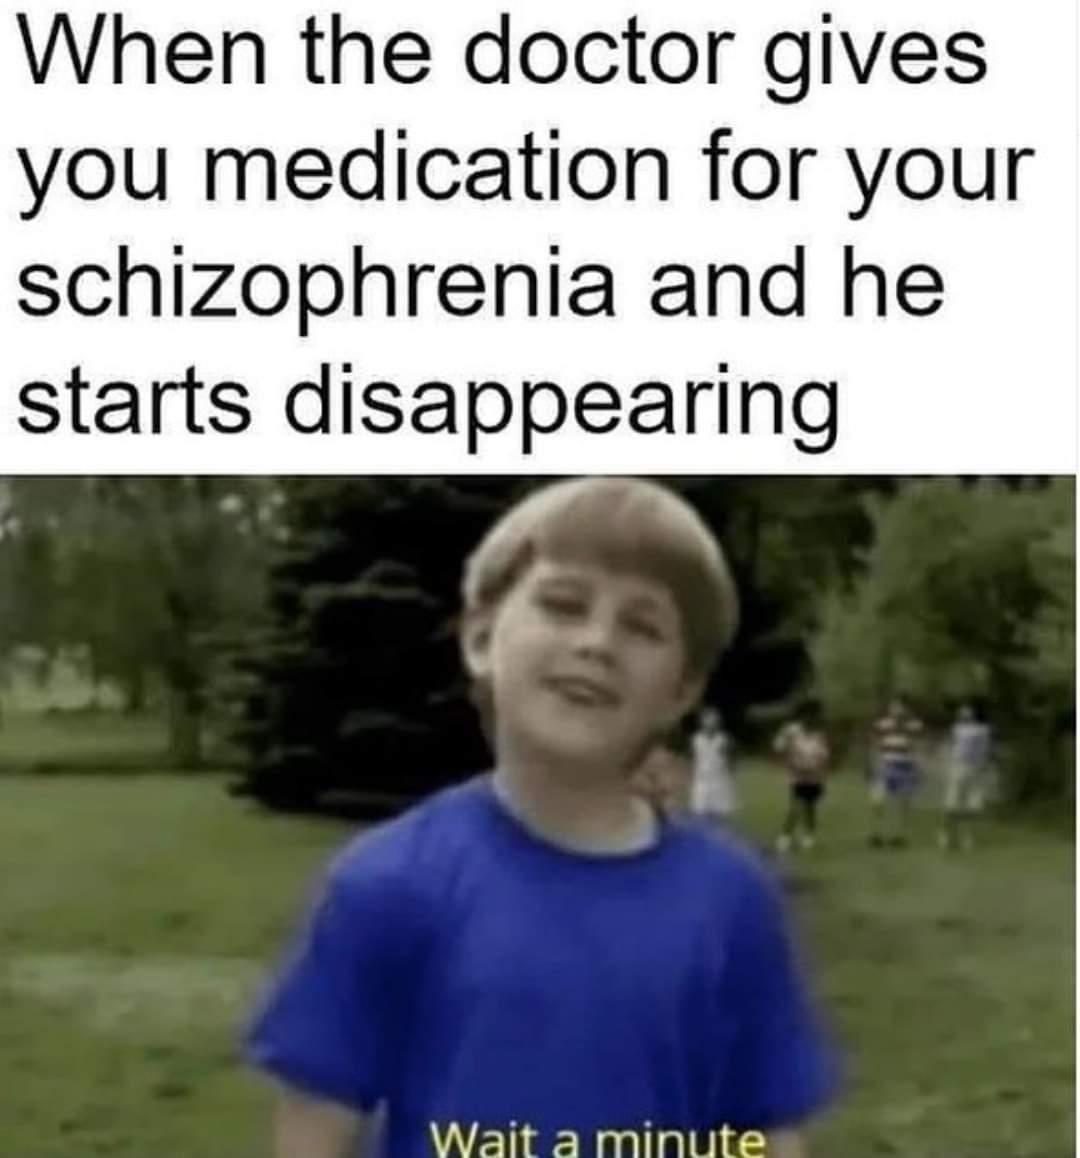 Memes dr. giving you medication for schizophrenia